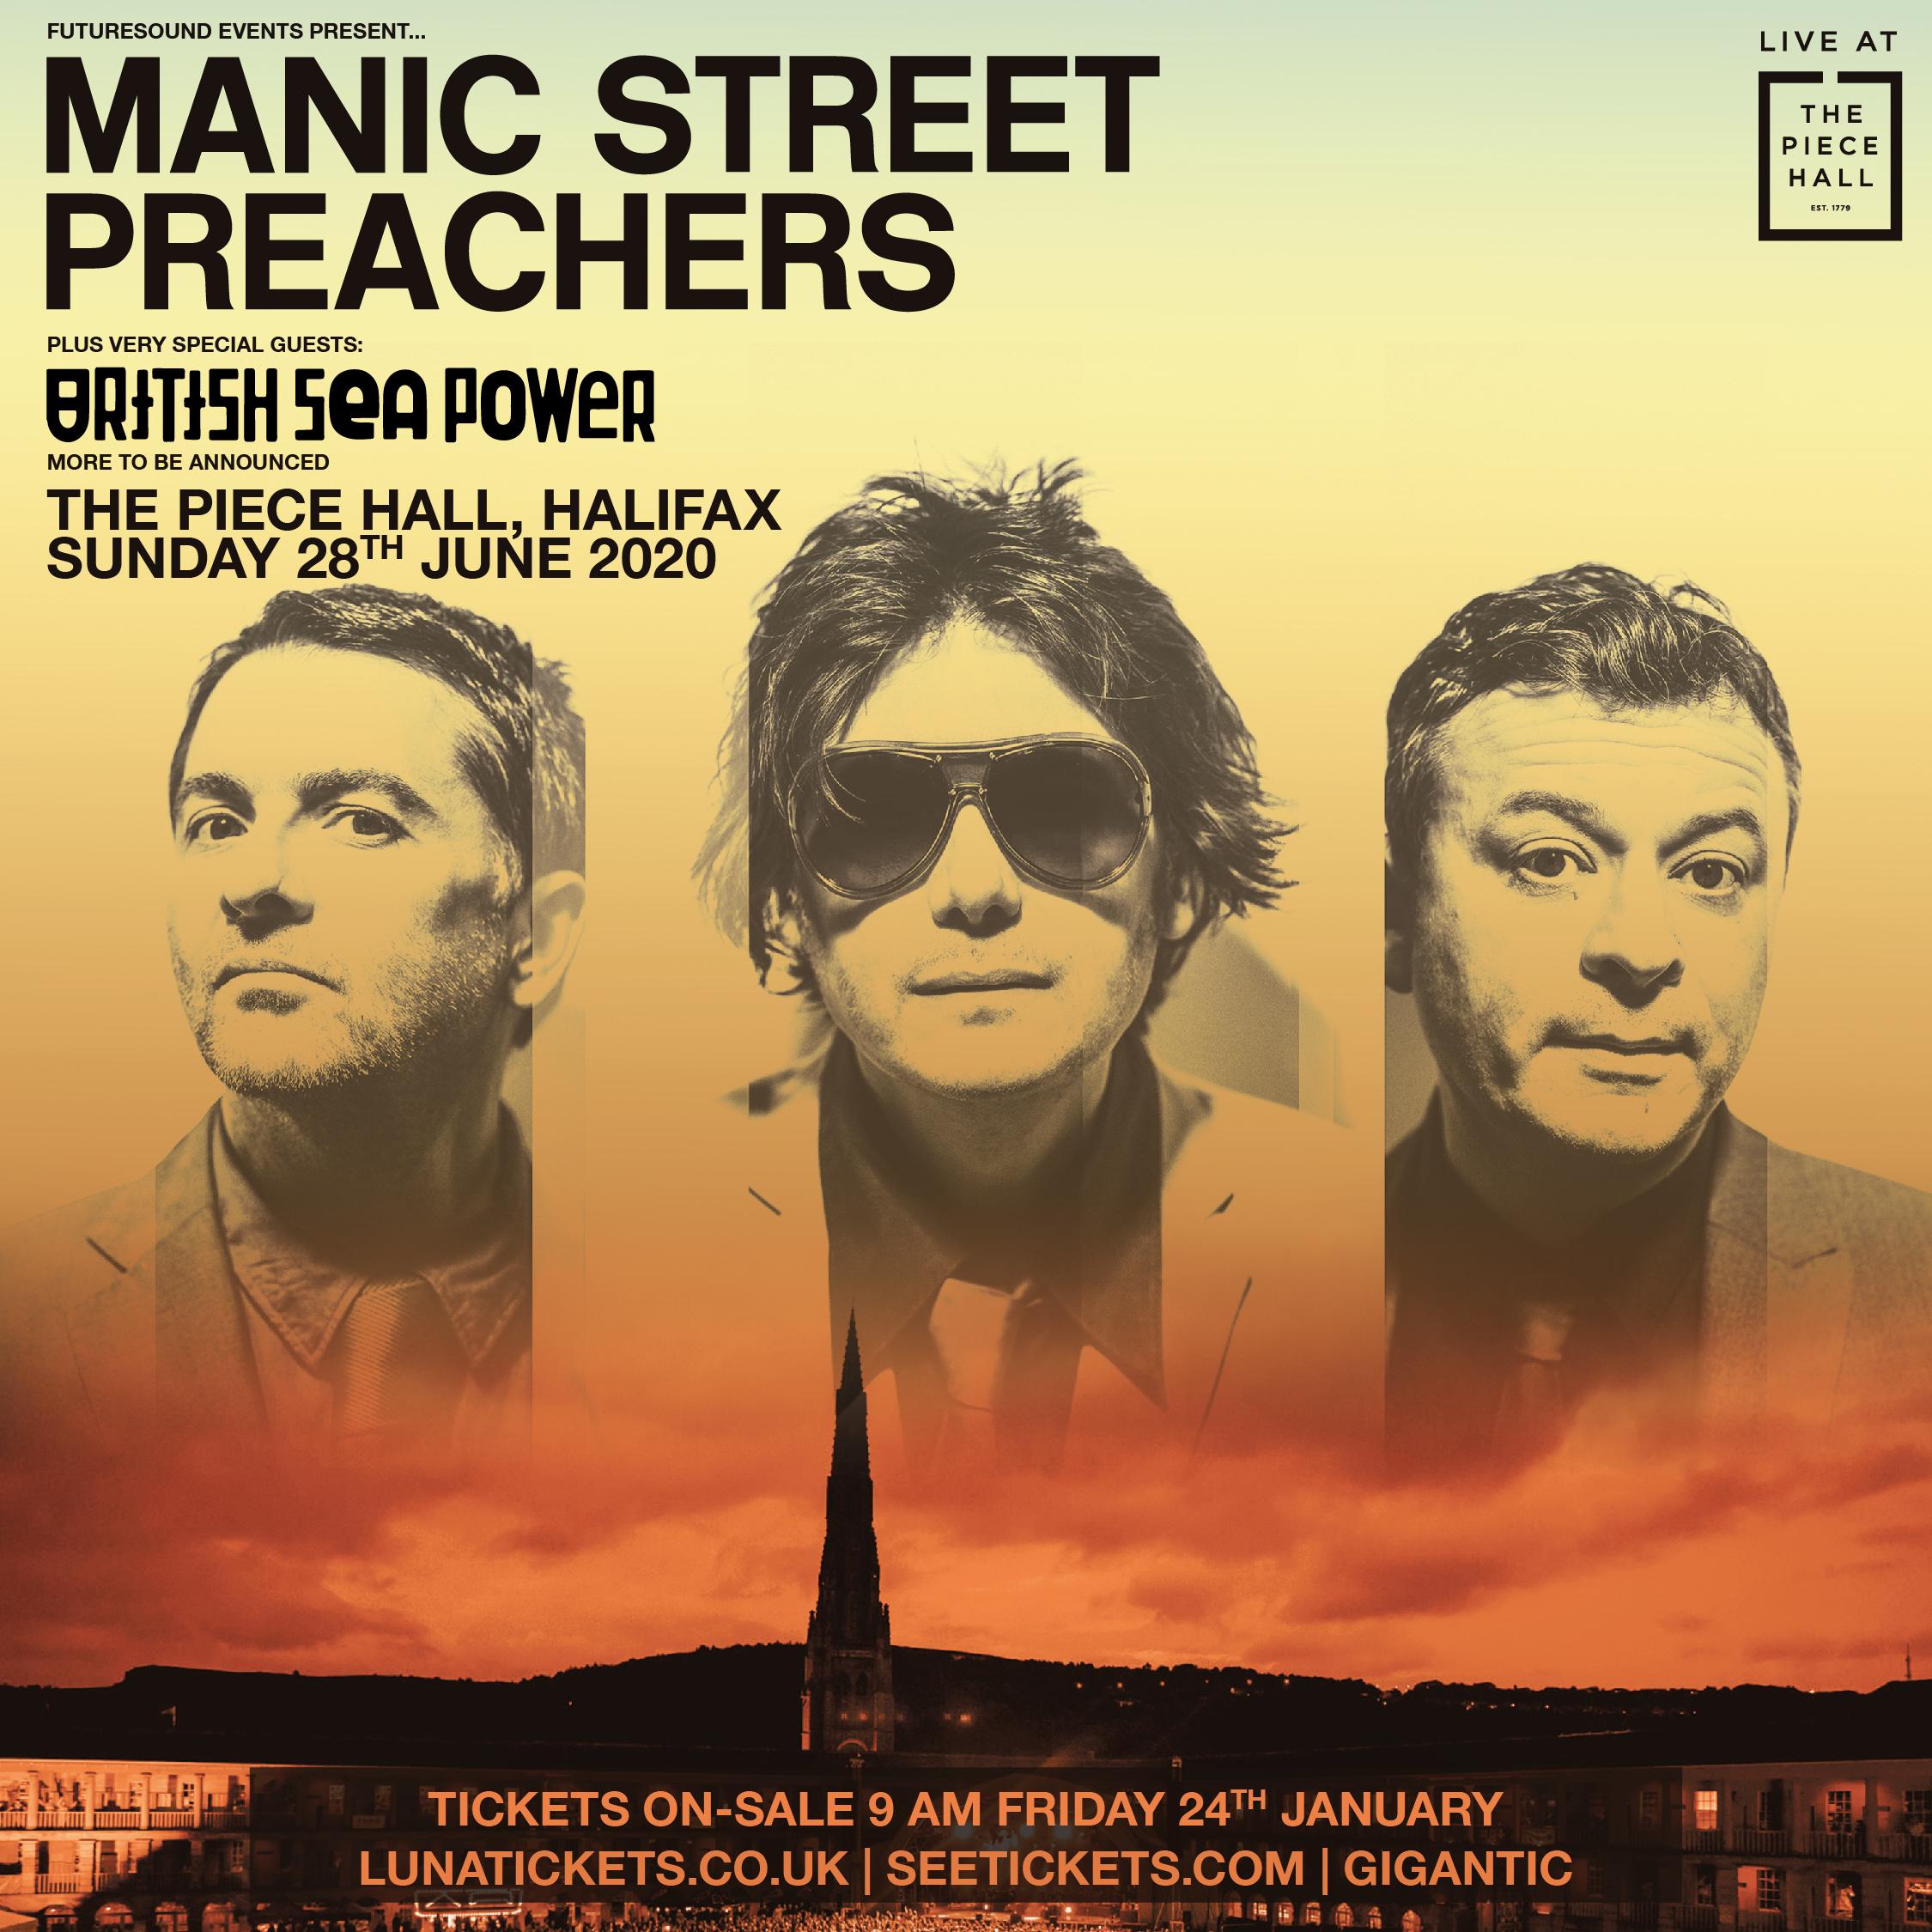 Manic Street Preachers – Square-01